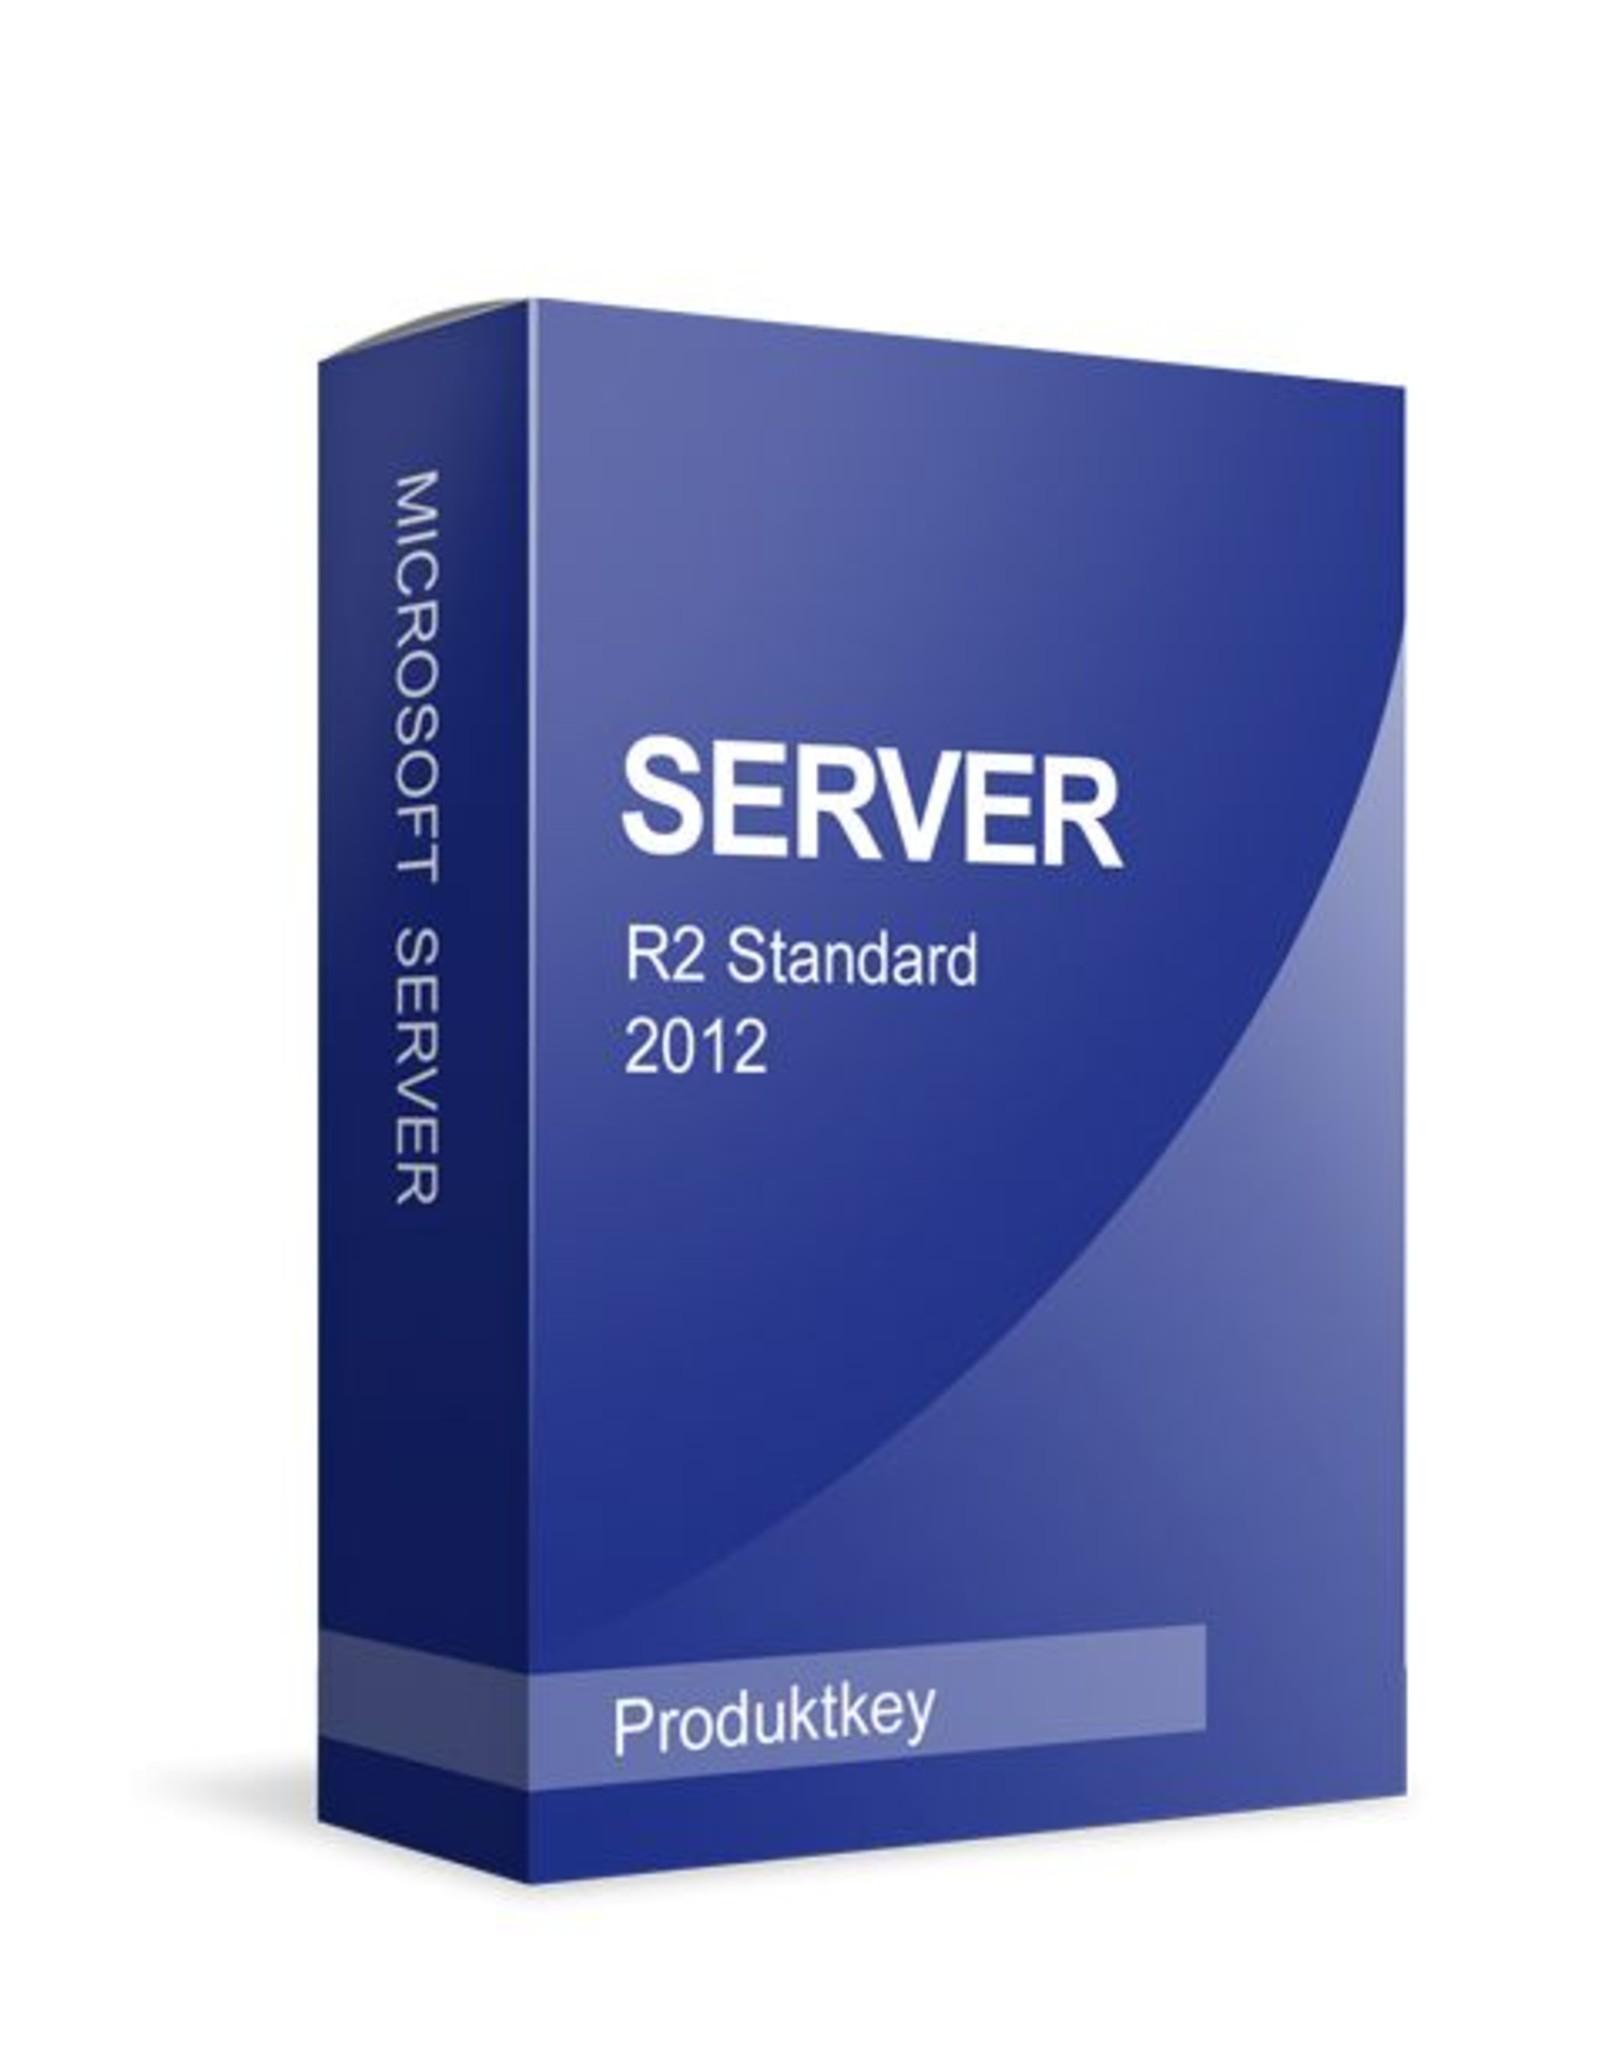 Microsoft Microsoft Windows Server 2012 R2 Standard